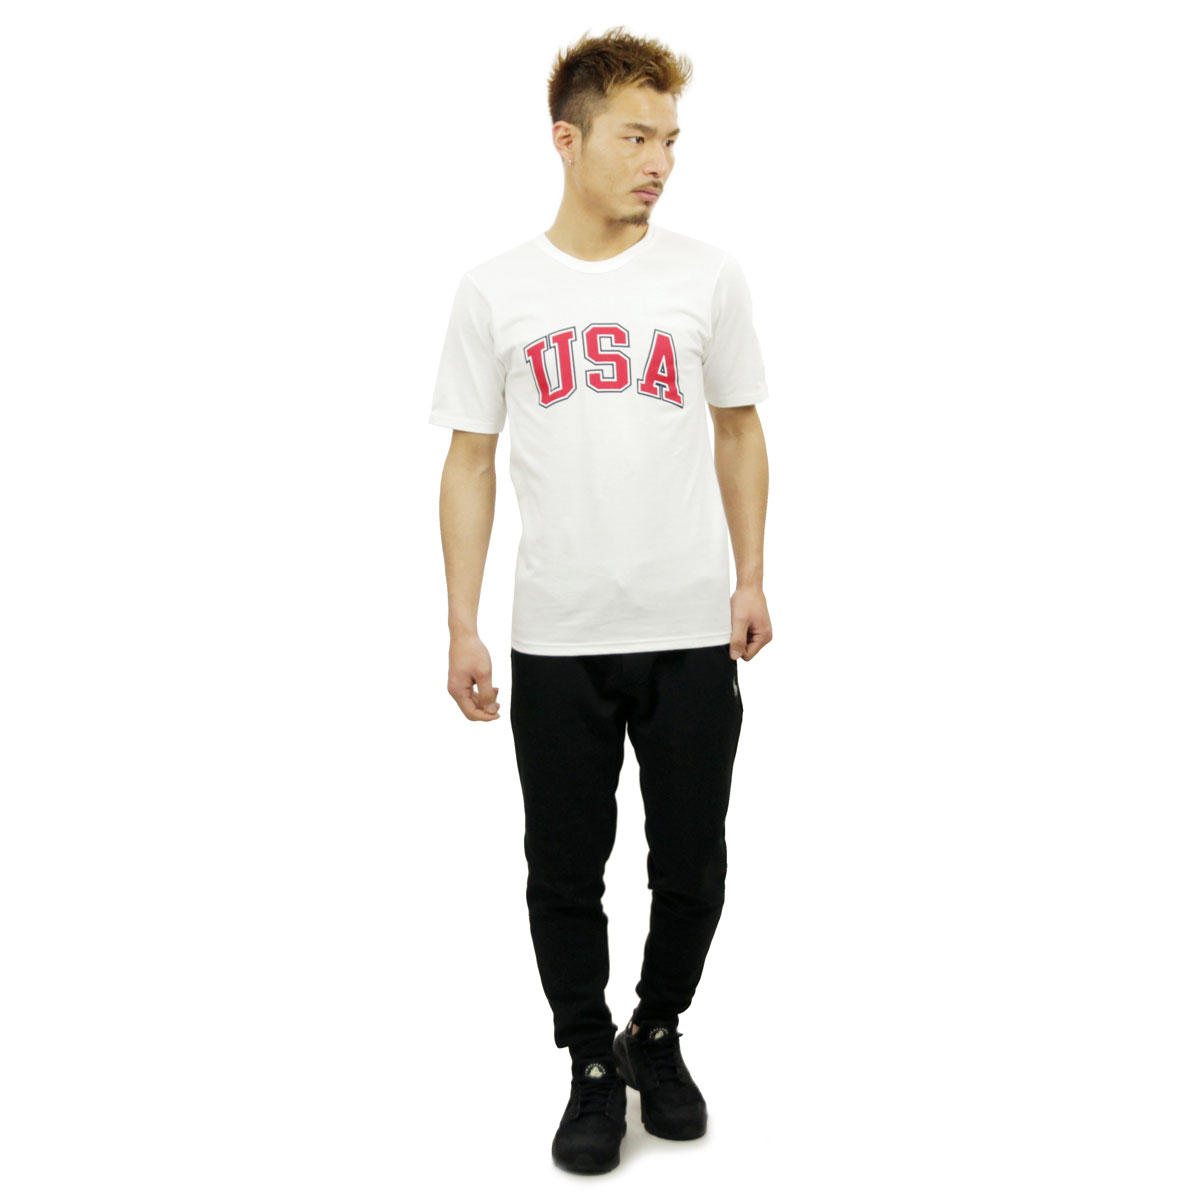 efd054eb2 チャンピオン CHAMPION 正規品 メンズ 半袖Tシャツ CREW TEE T1919P Heritage Tee 045-WHITE